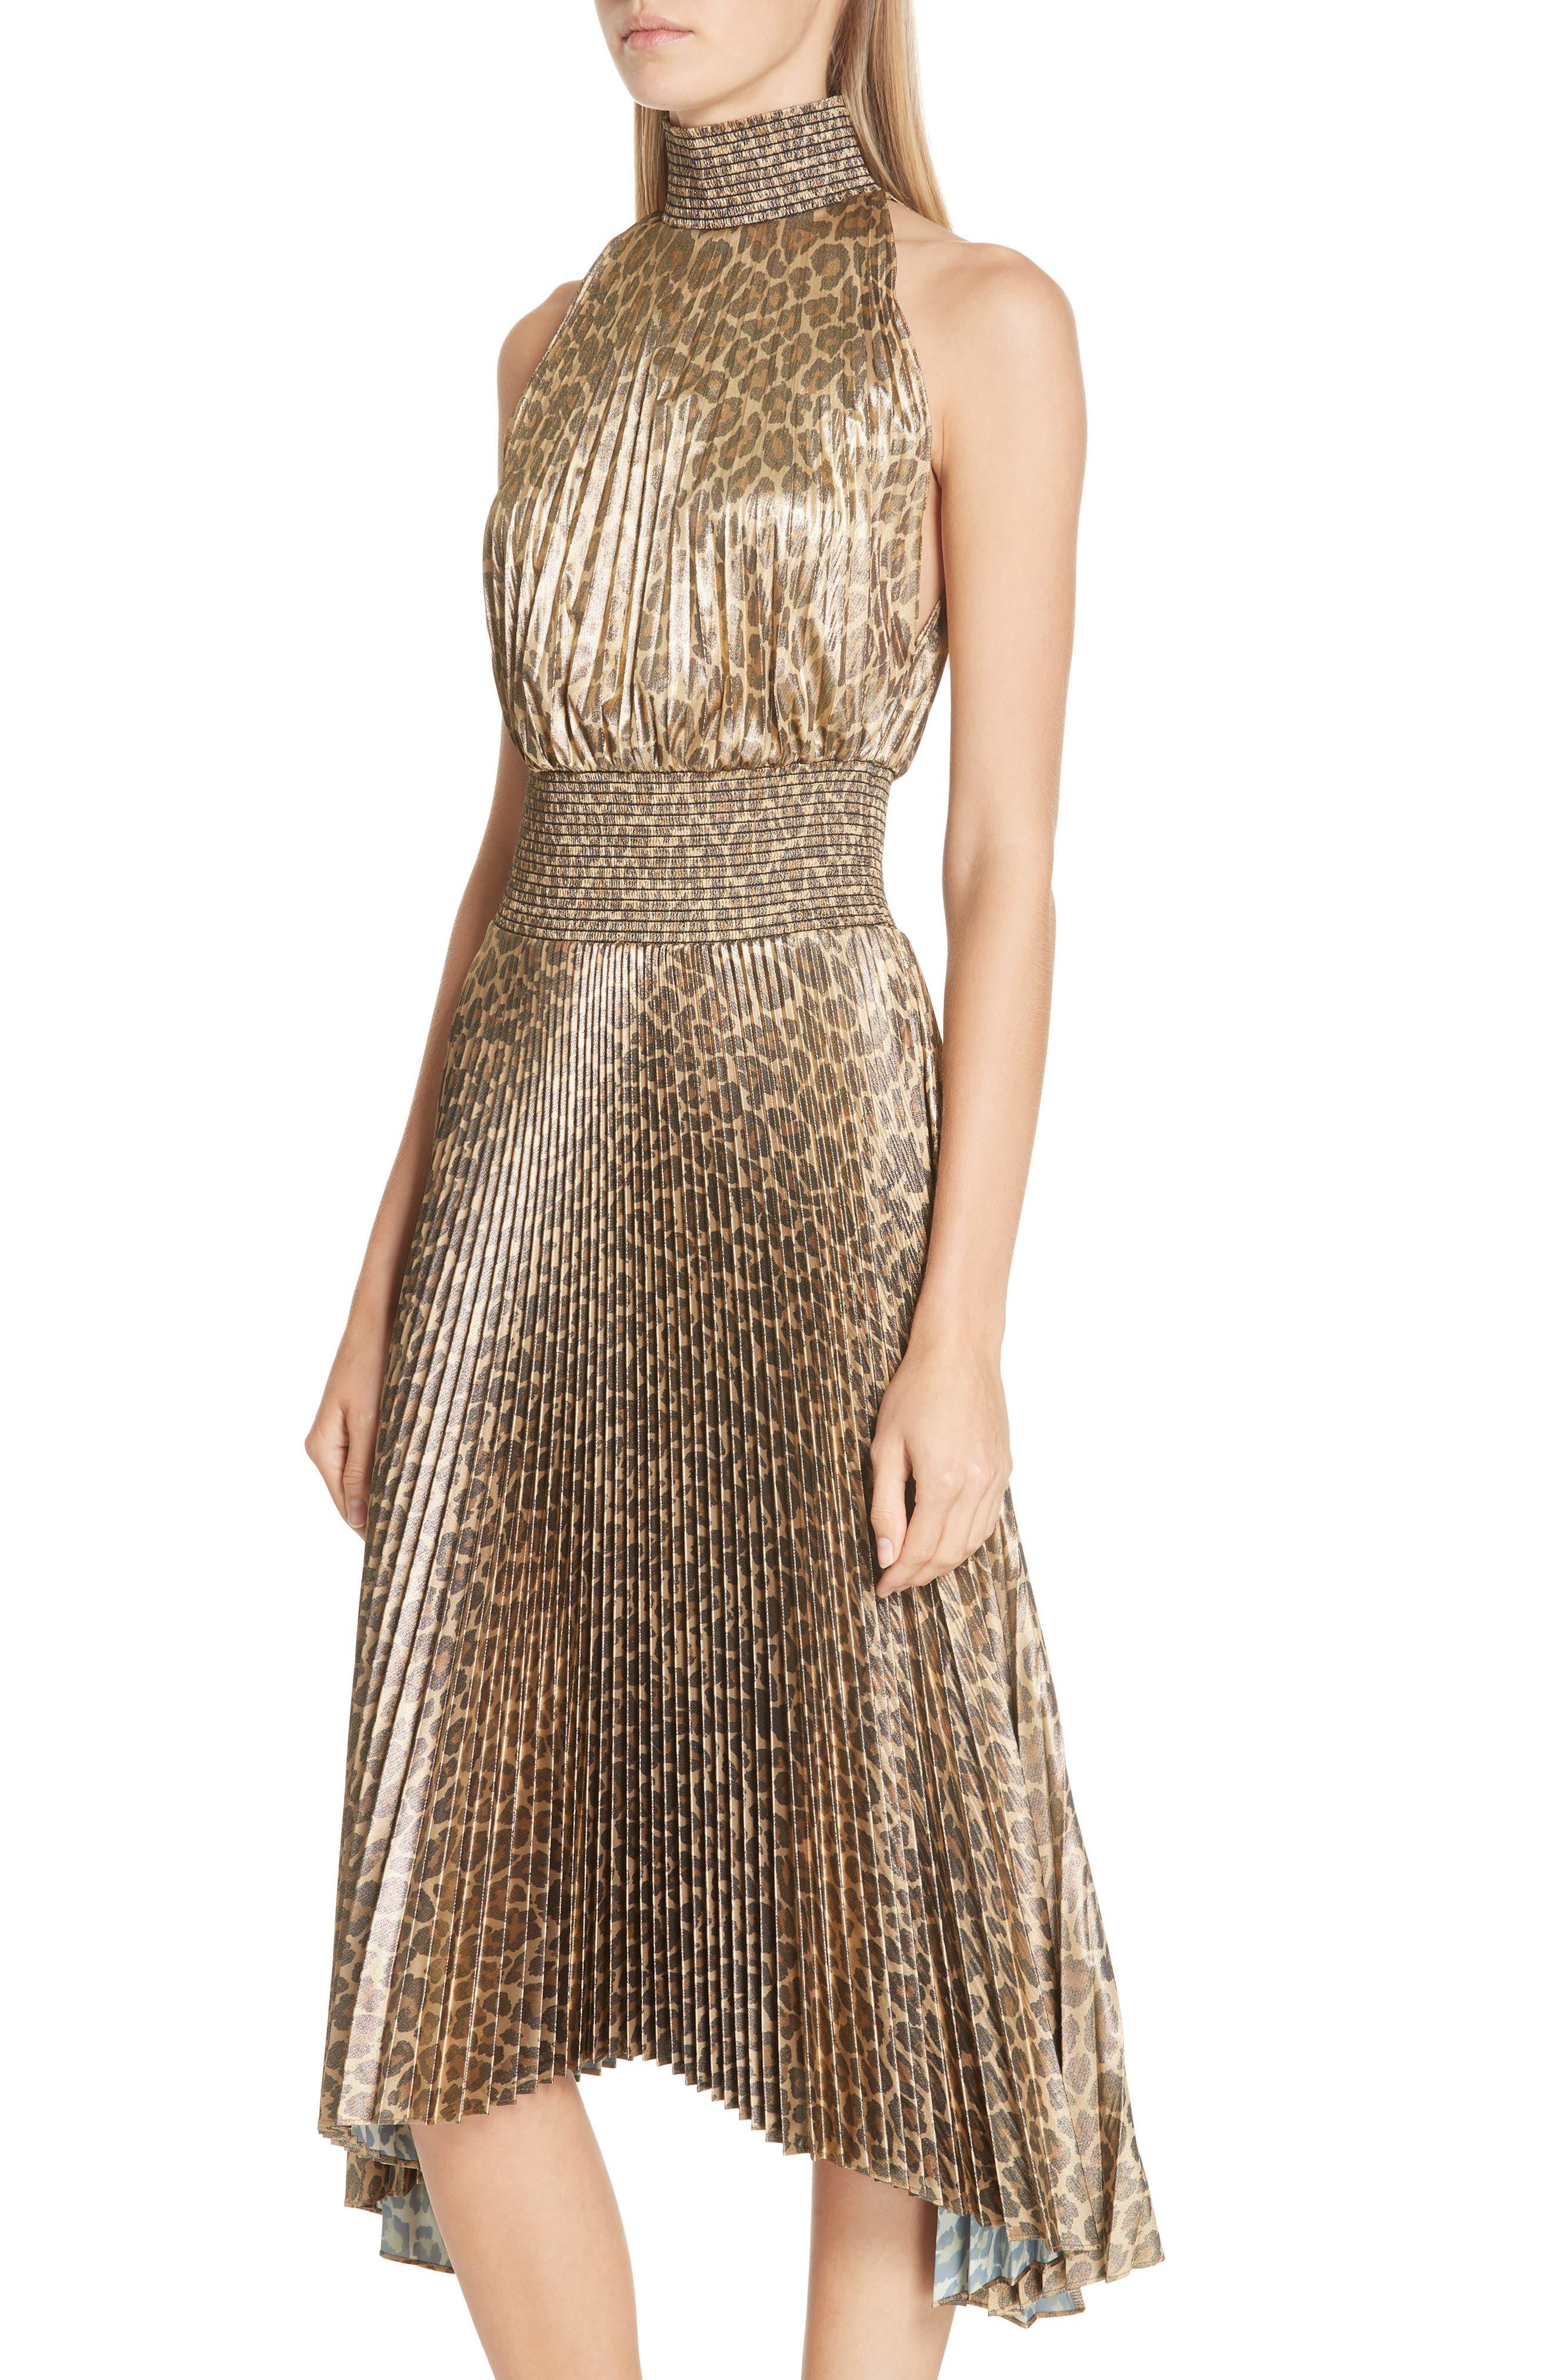 Renzo Leopard Print Metallic Foil Dress,                             Alternate thumbnail 4, color,                             METALLIC GOLD